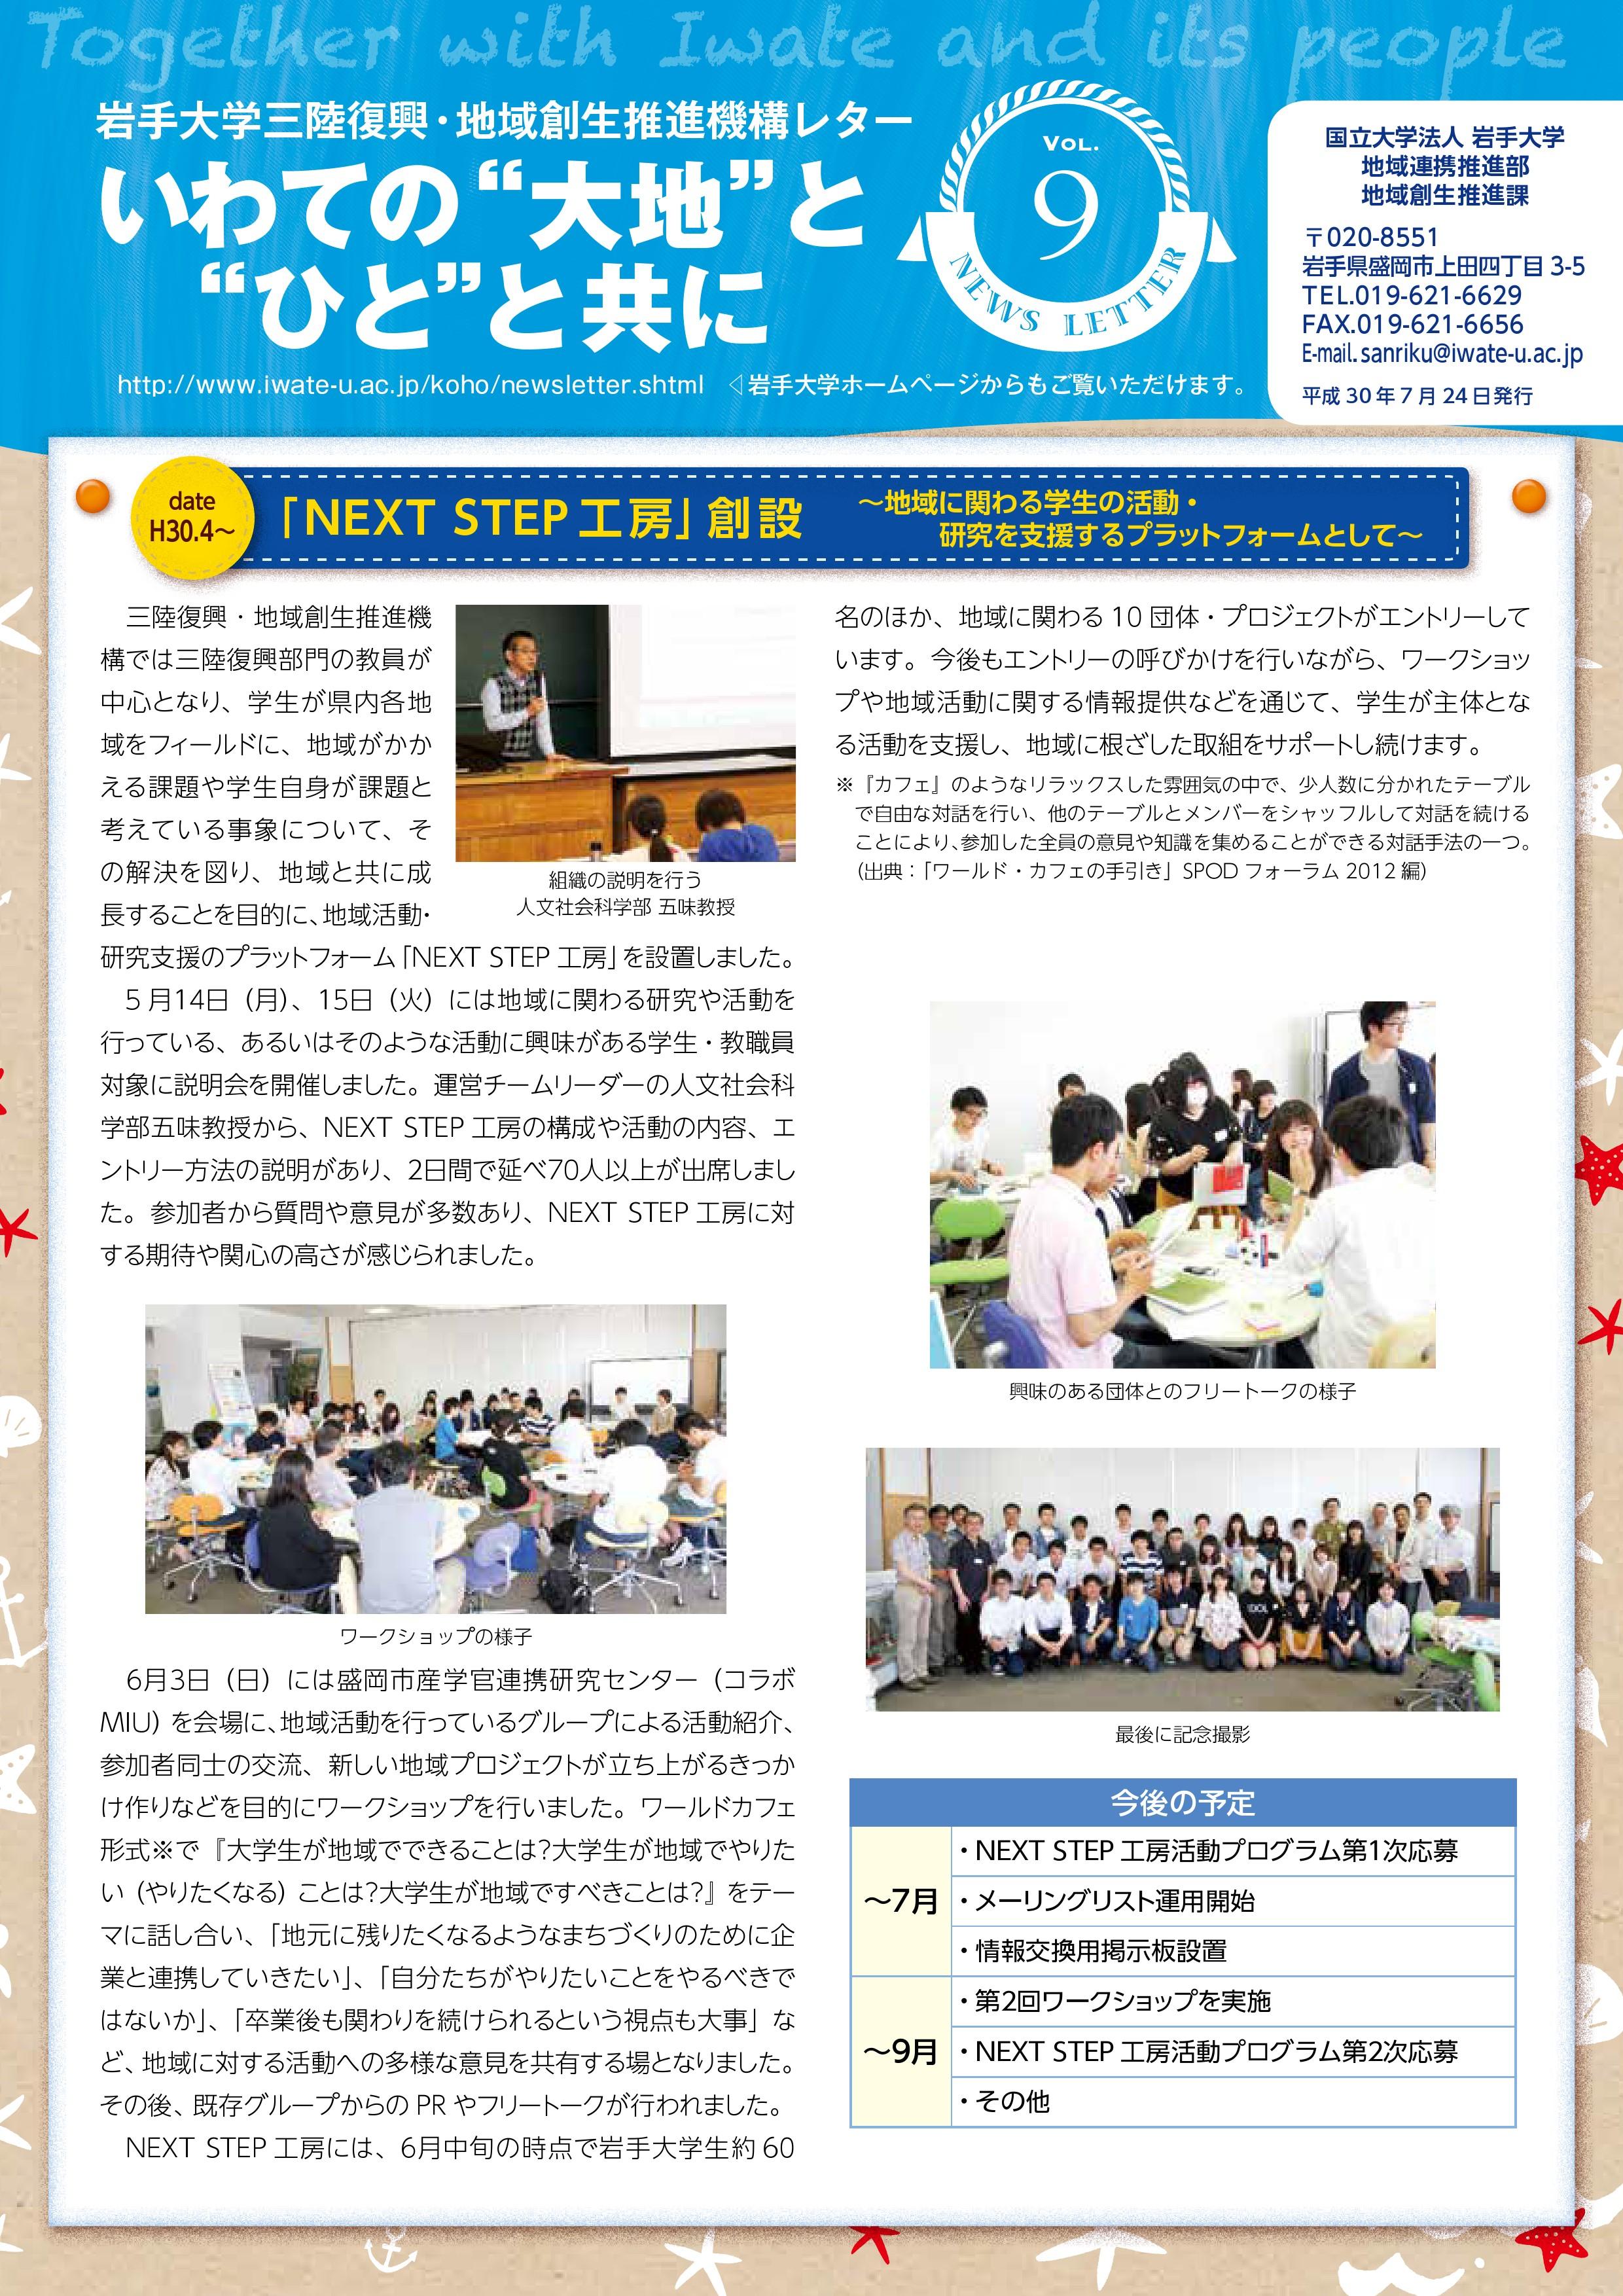 Vol.9 「 NEXT STEP工房」創設 ~地域に関わる学生の活動・研究を支援するプラットフォームとして~